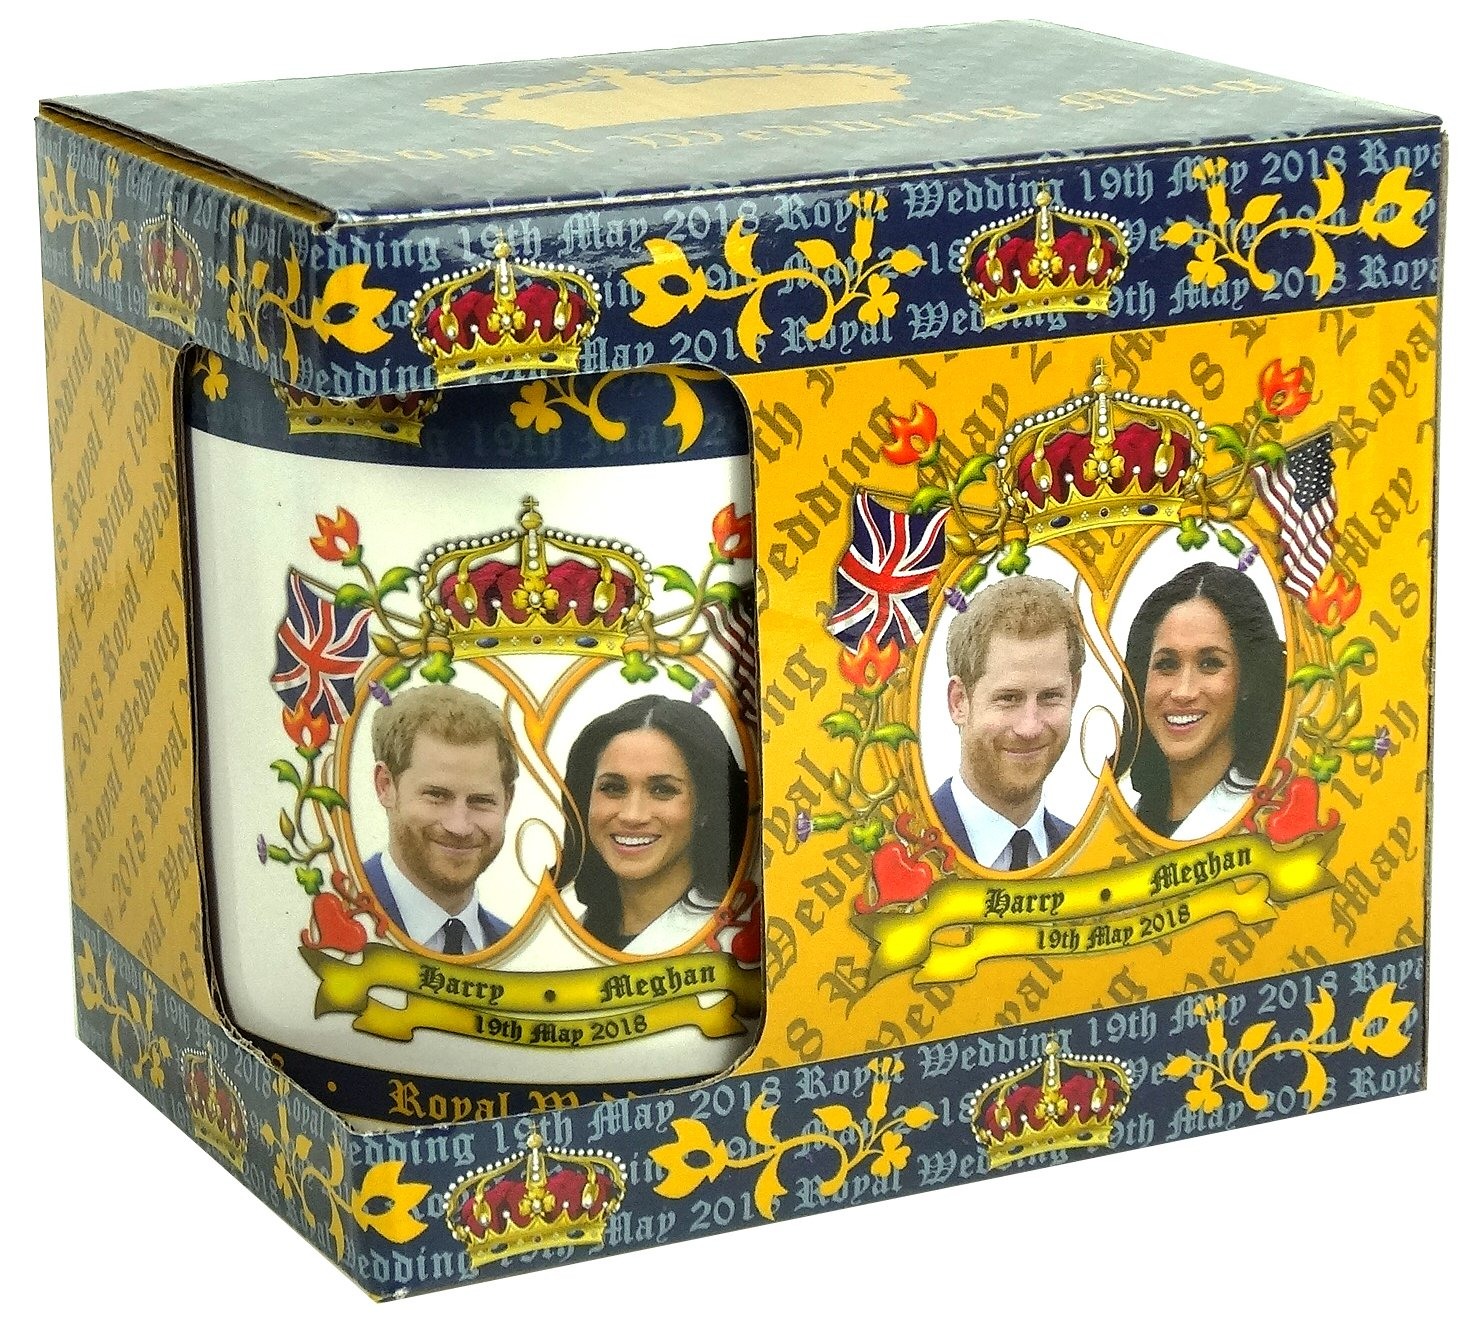 Amazon.com: Royal Wedding Tea Coffee Mug Prince Harry Meghan Markle May 19 2018: Kitchen & Dining